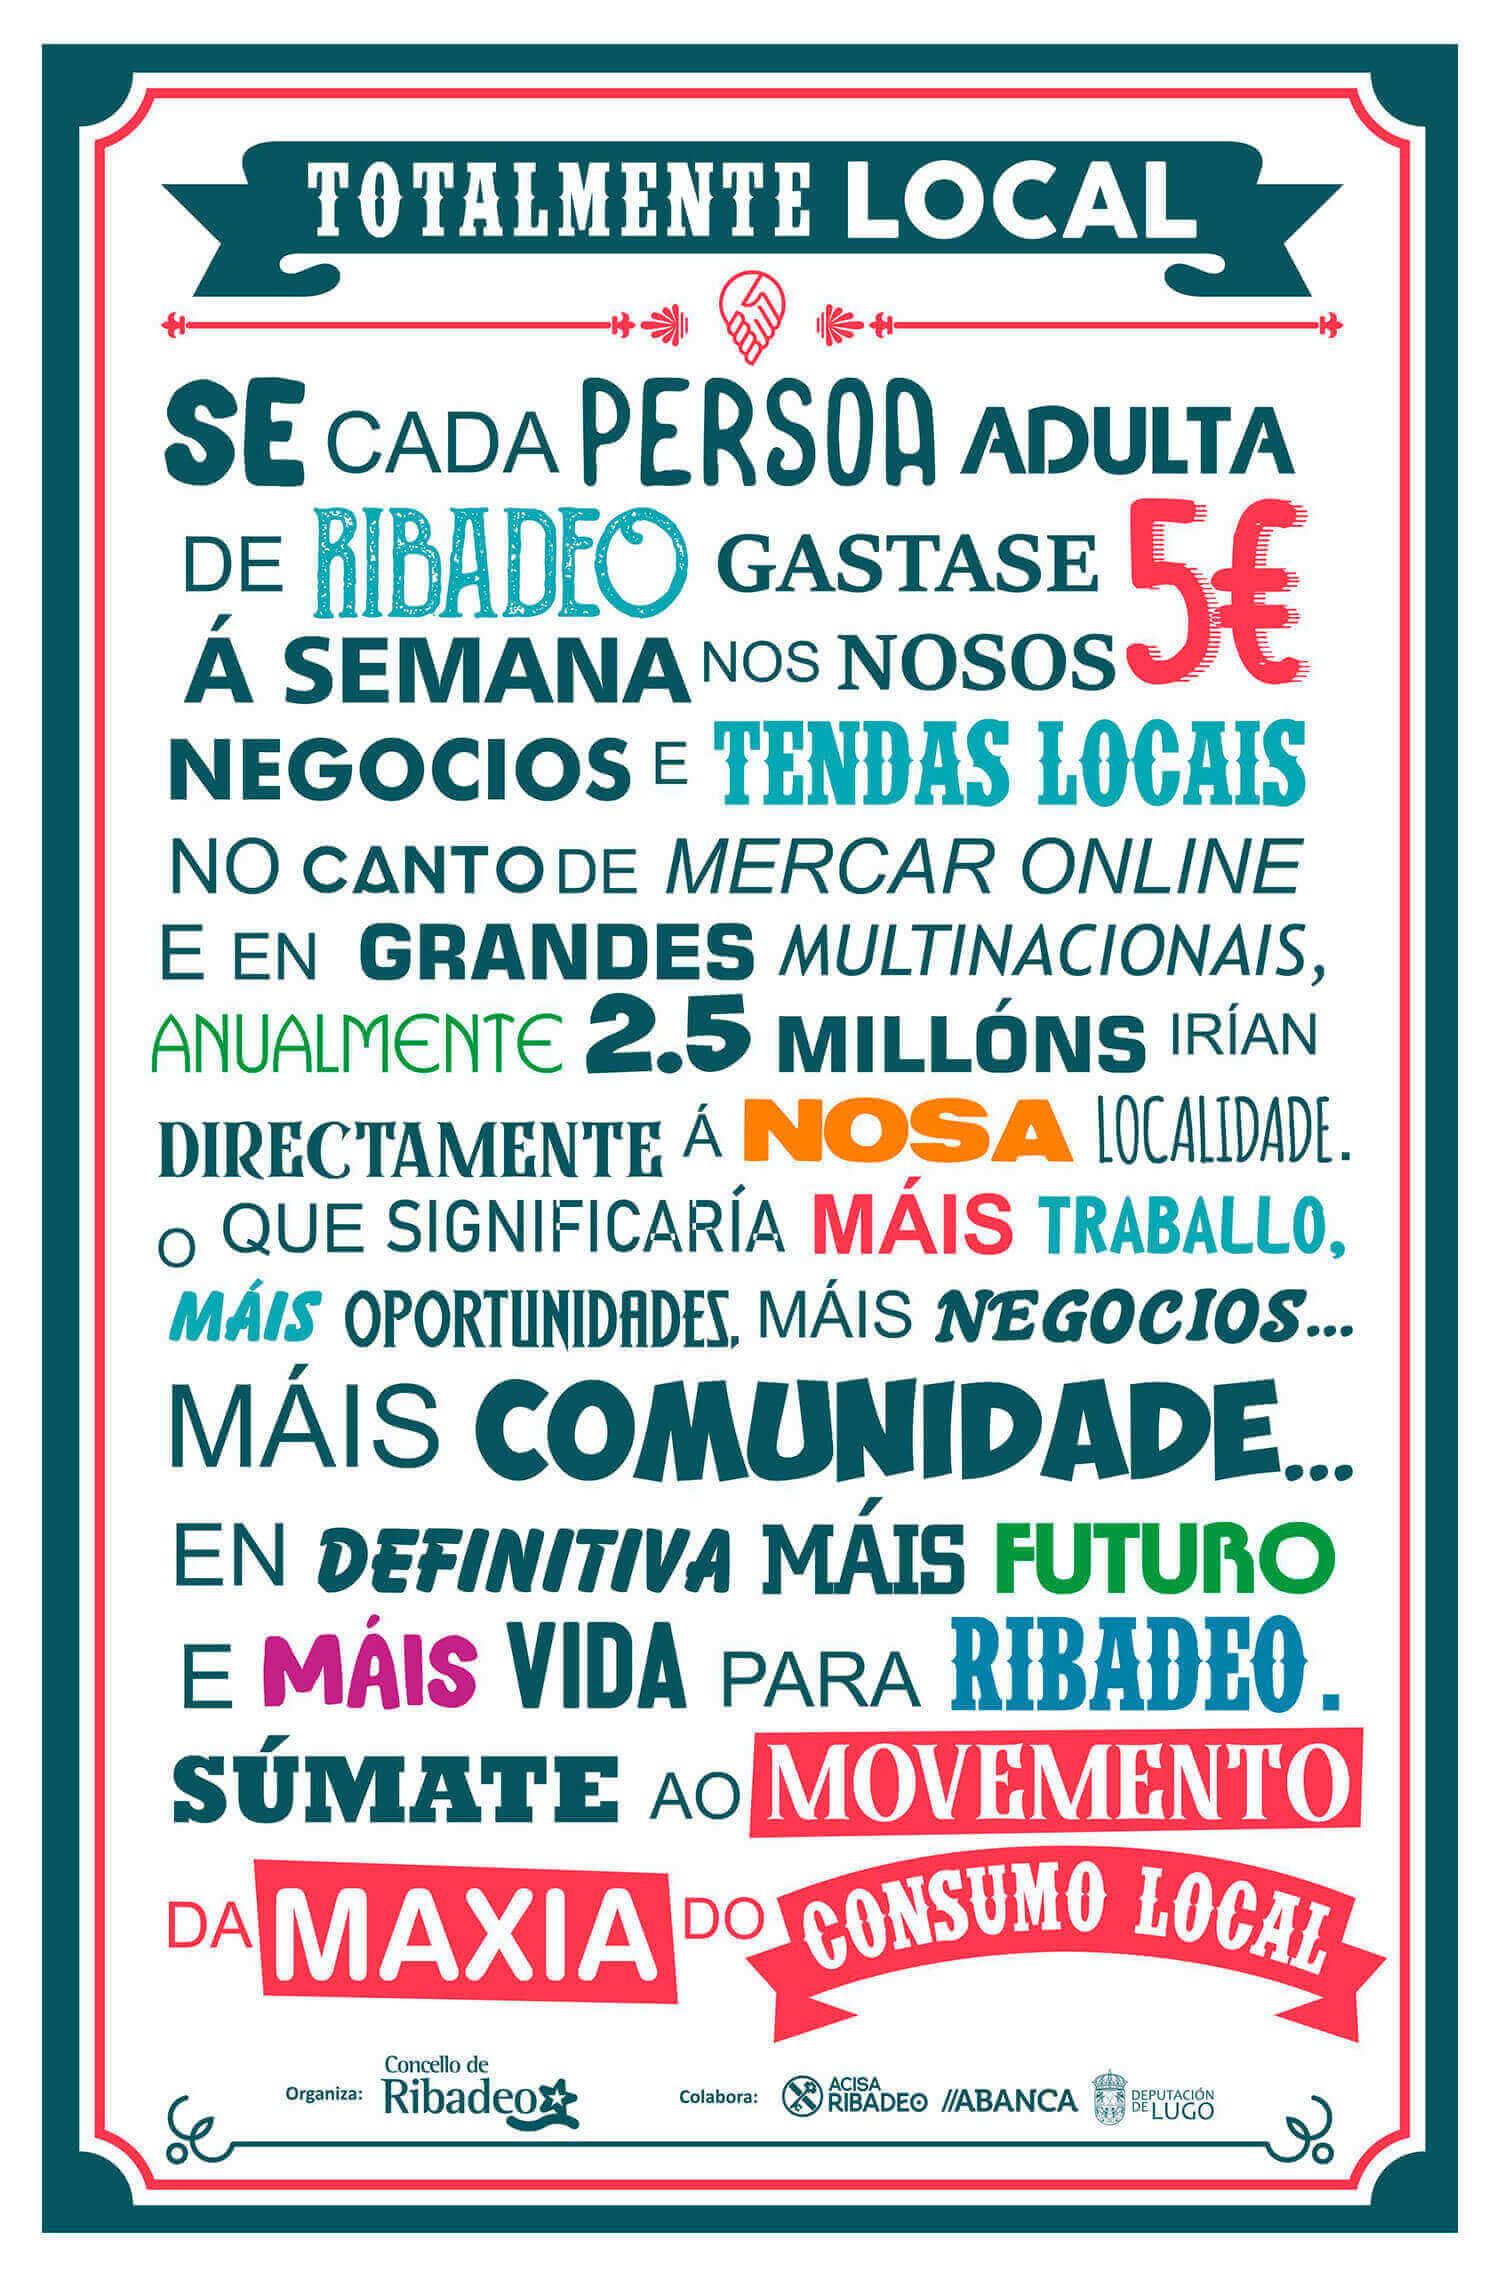 Manifesto pancha 2020 Ribadeo moeda